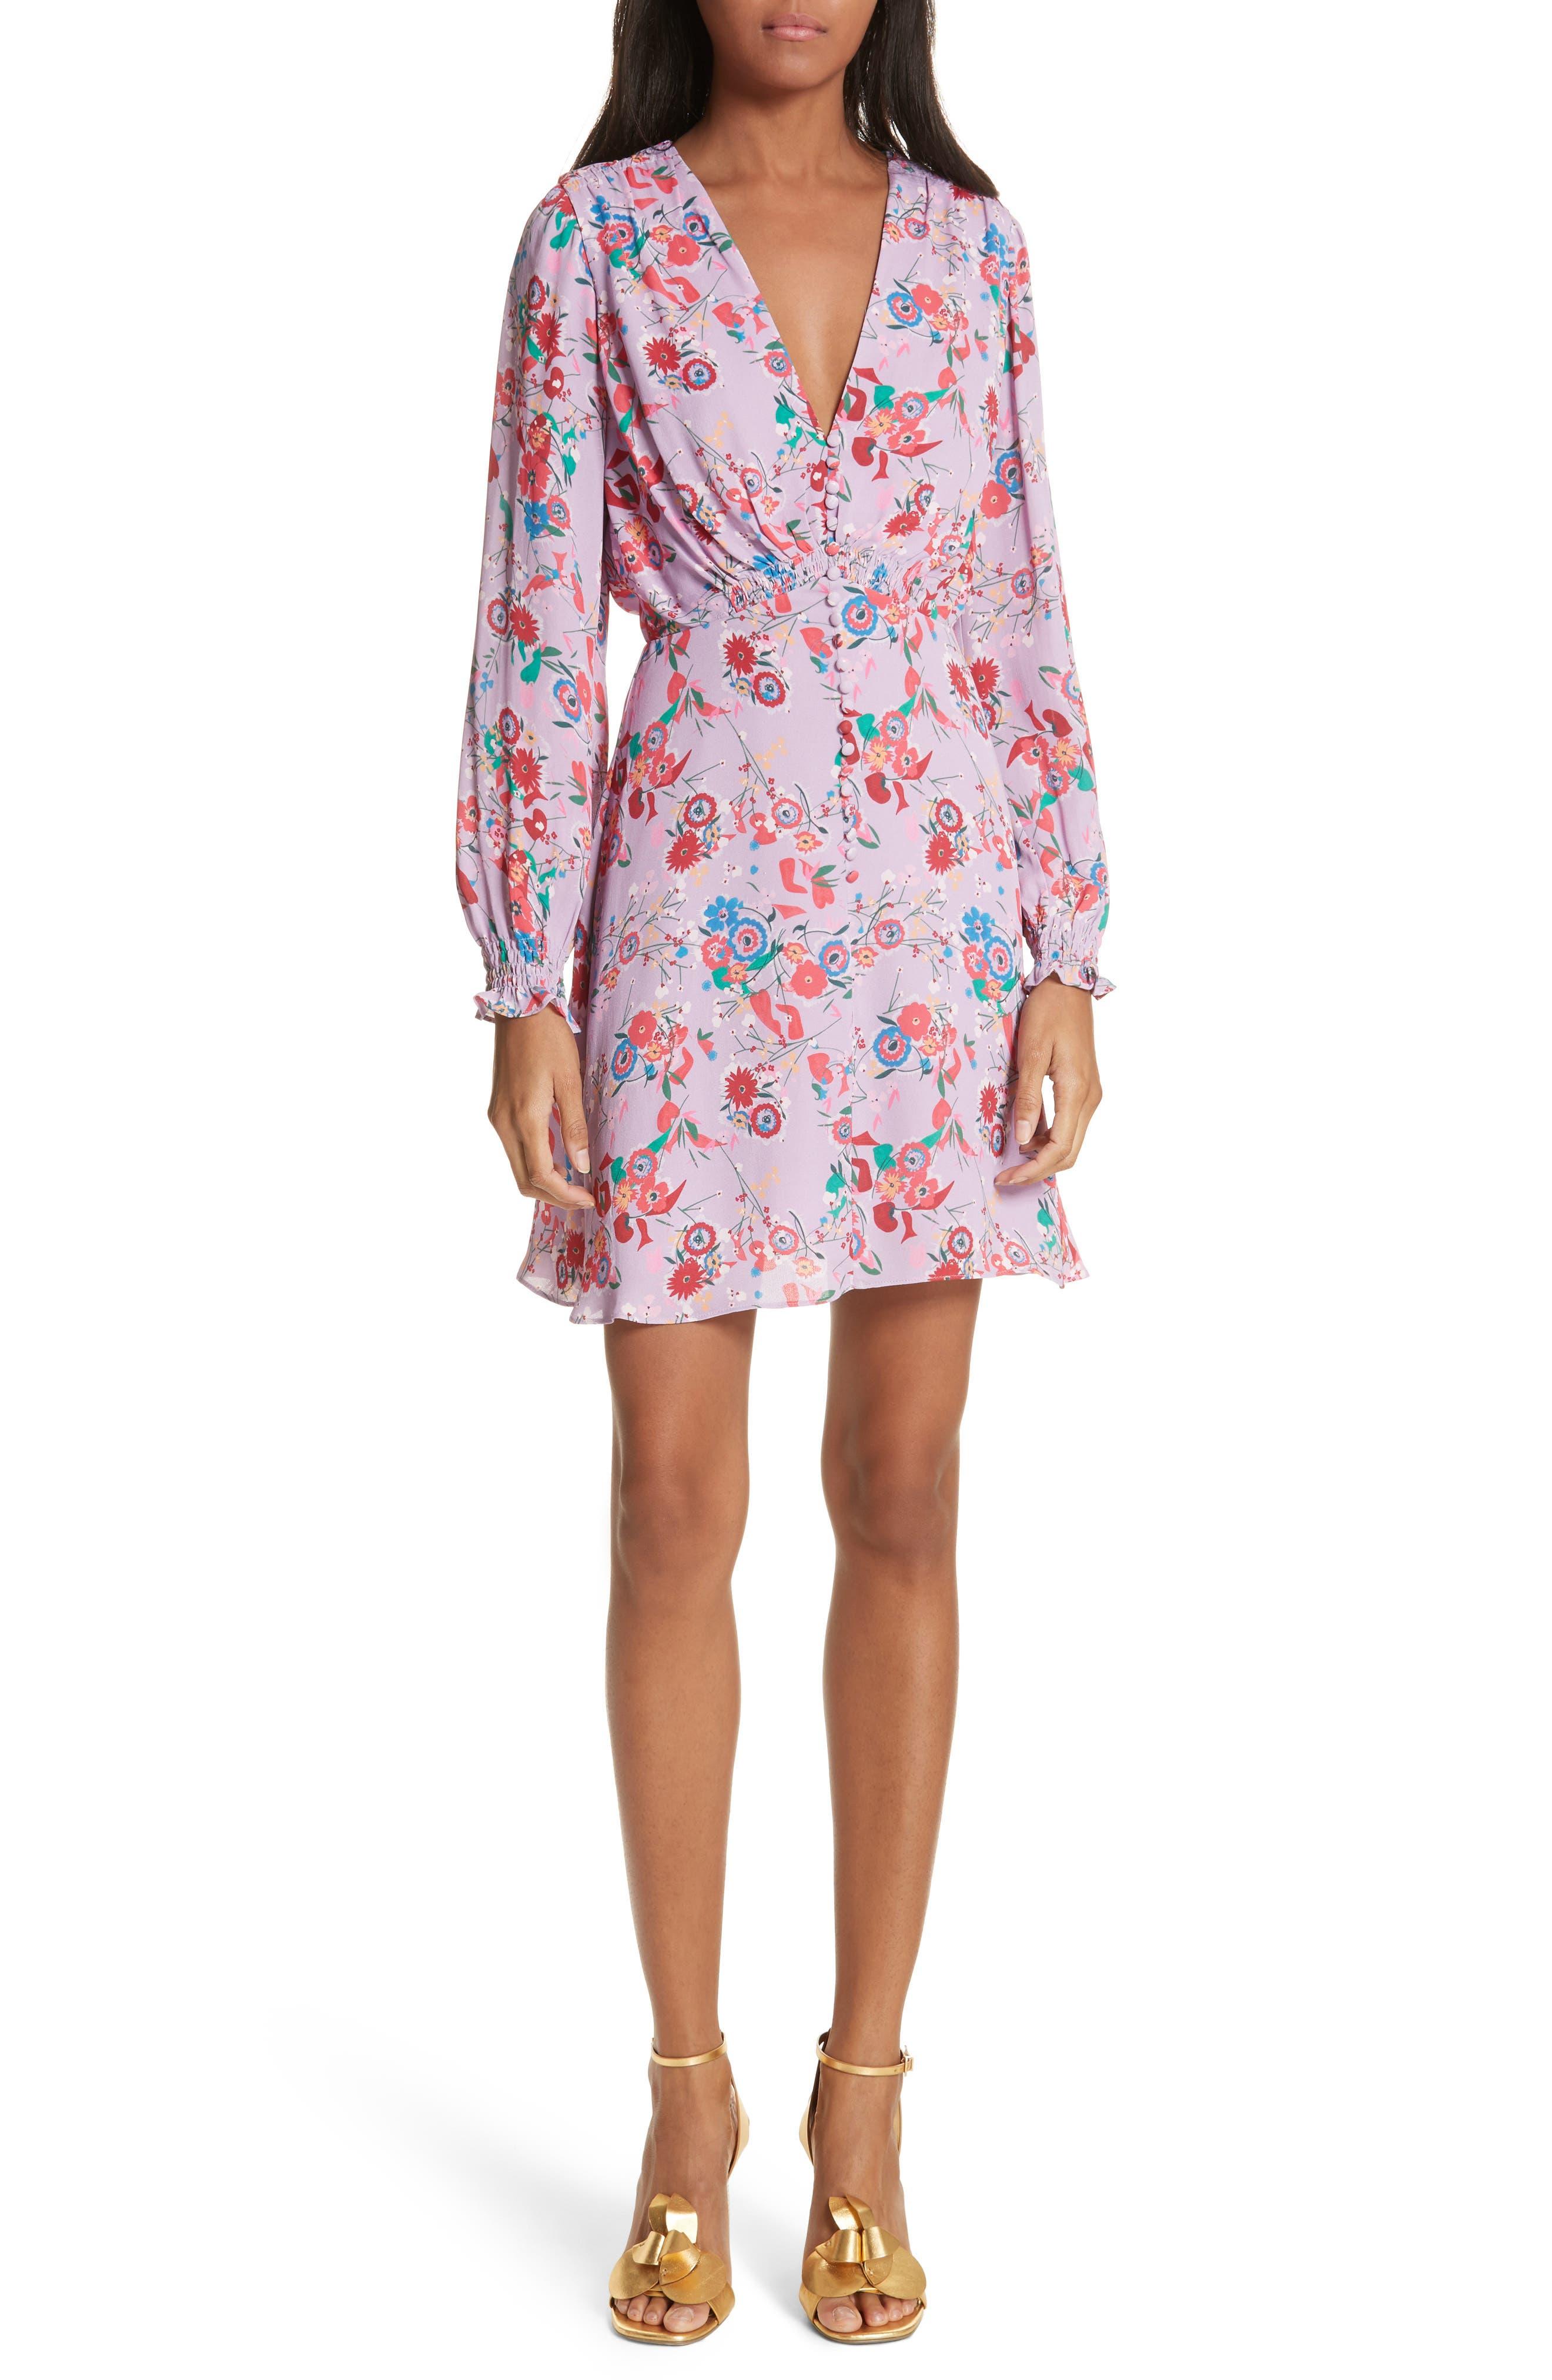 SALONI Eve Floral Print Dress